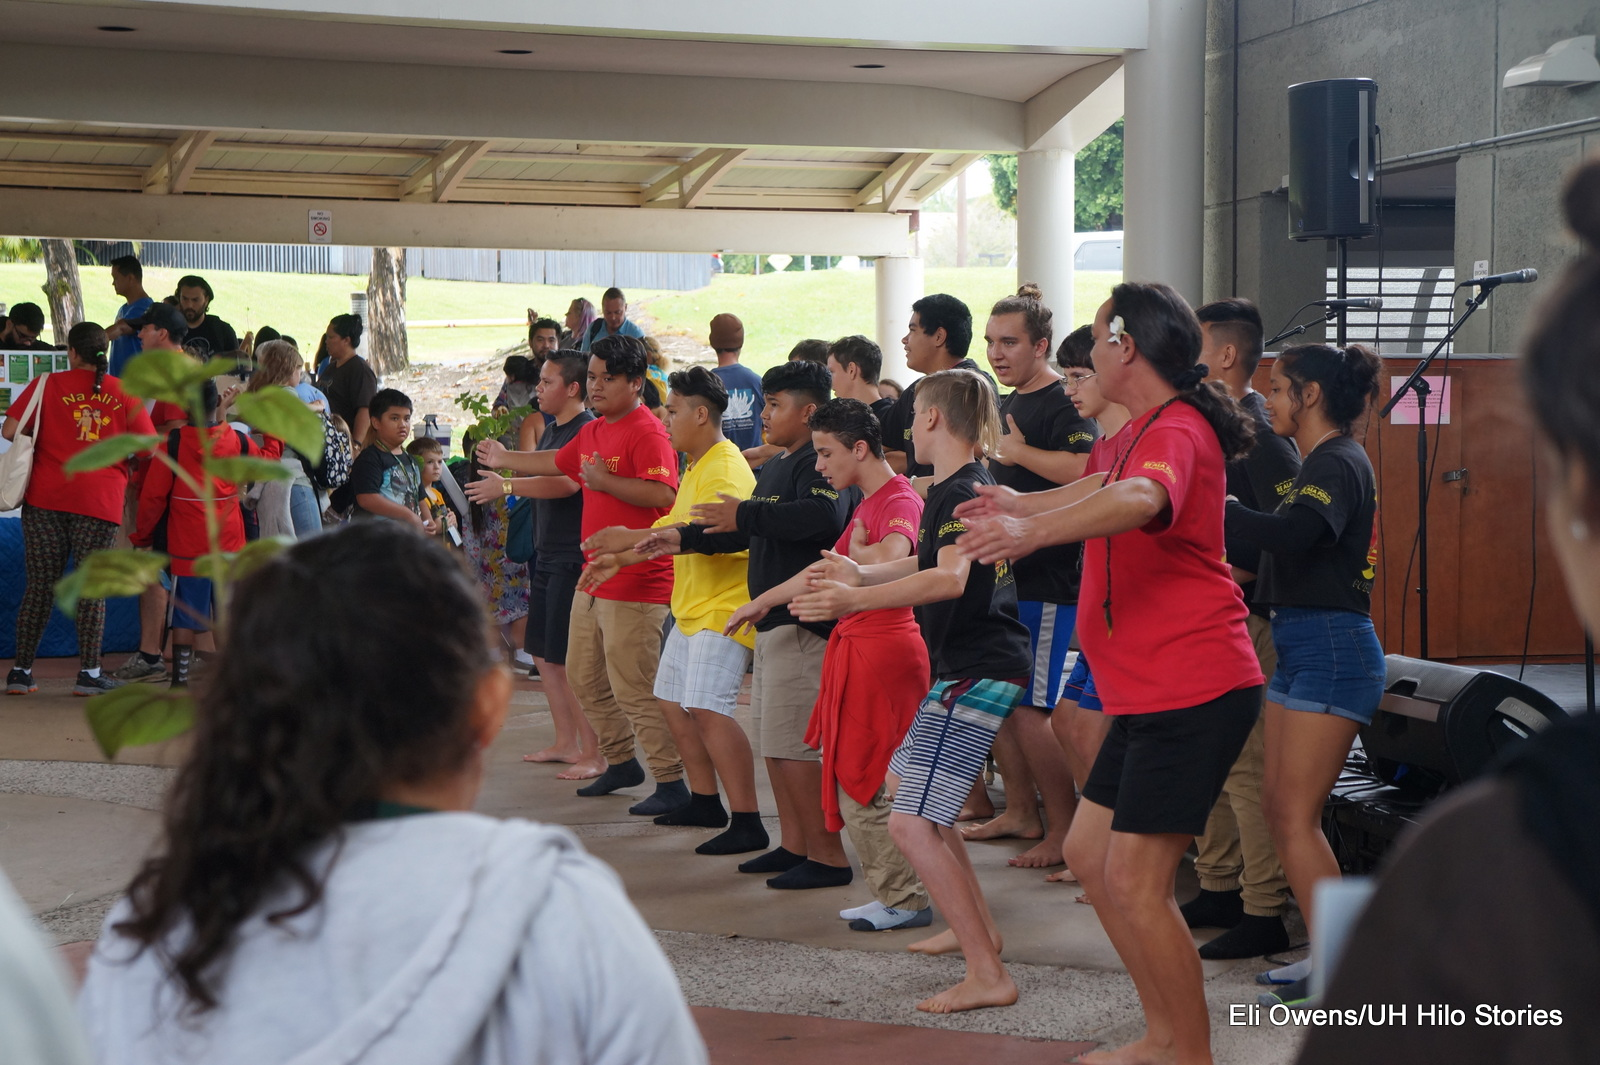 GROUP DANCING.